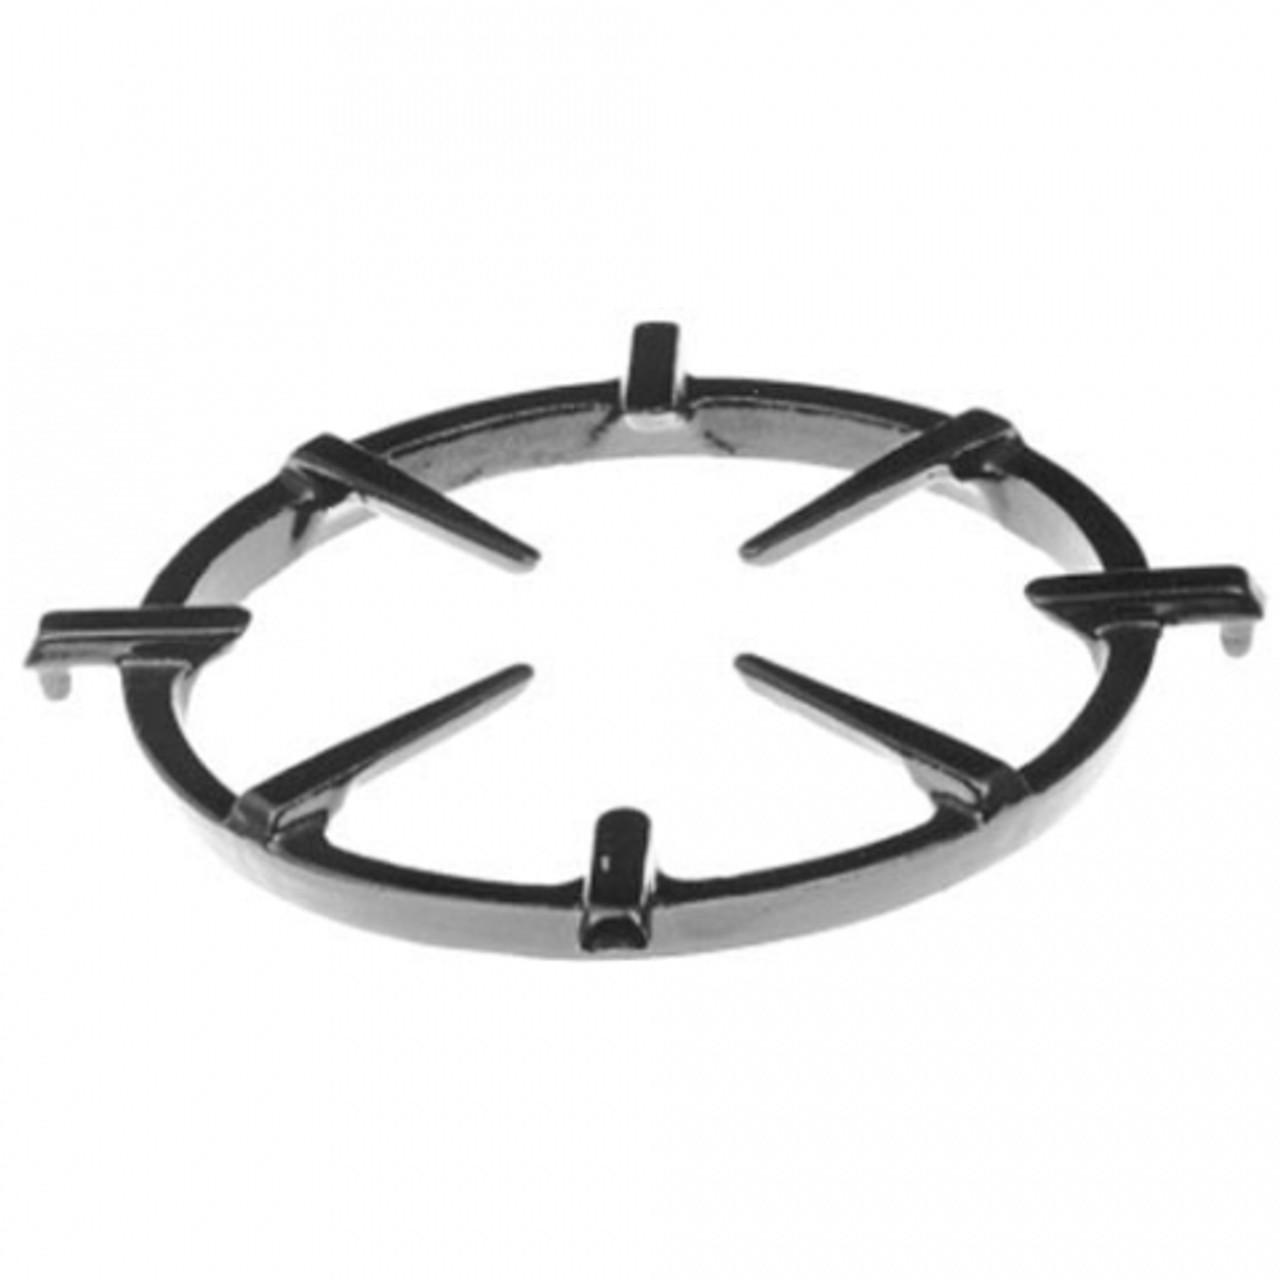 Garland - Ring Grate9-3/16d, 11-1/8 Longst P - G5429E